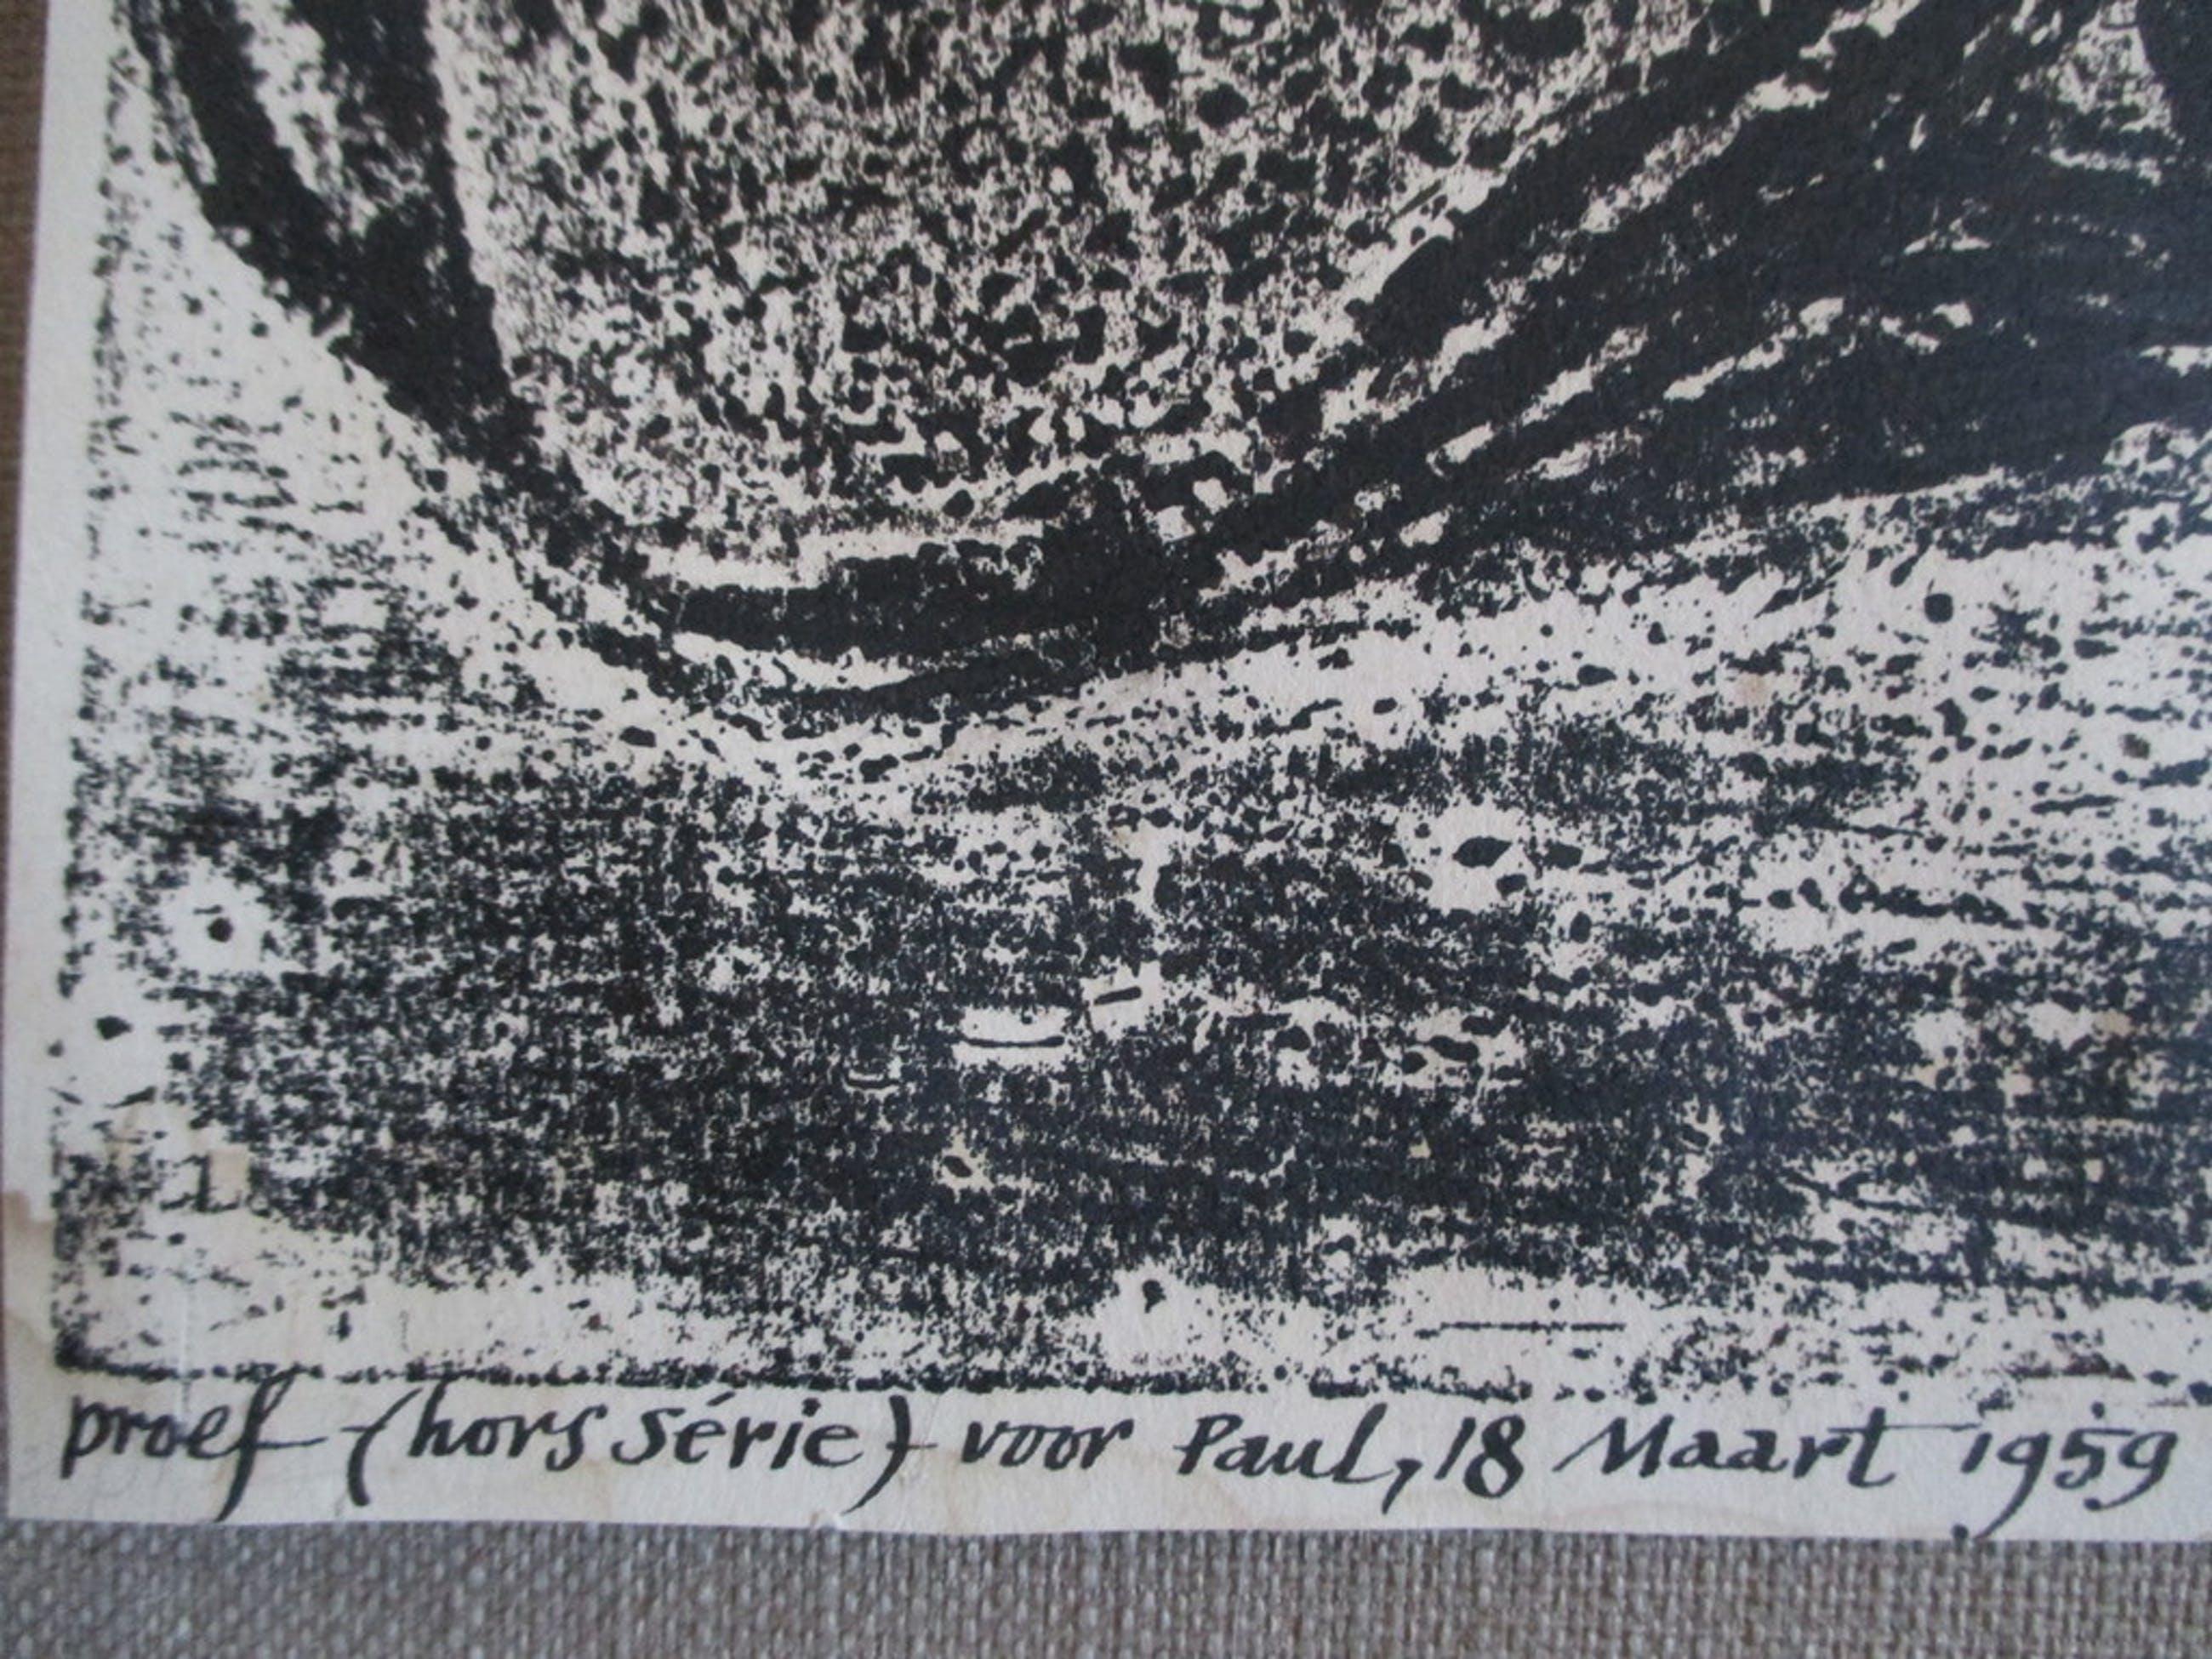 W.J Rozendaal, litho portret Paul Huf 1959 kopen? Bied vanaf 40!